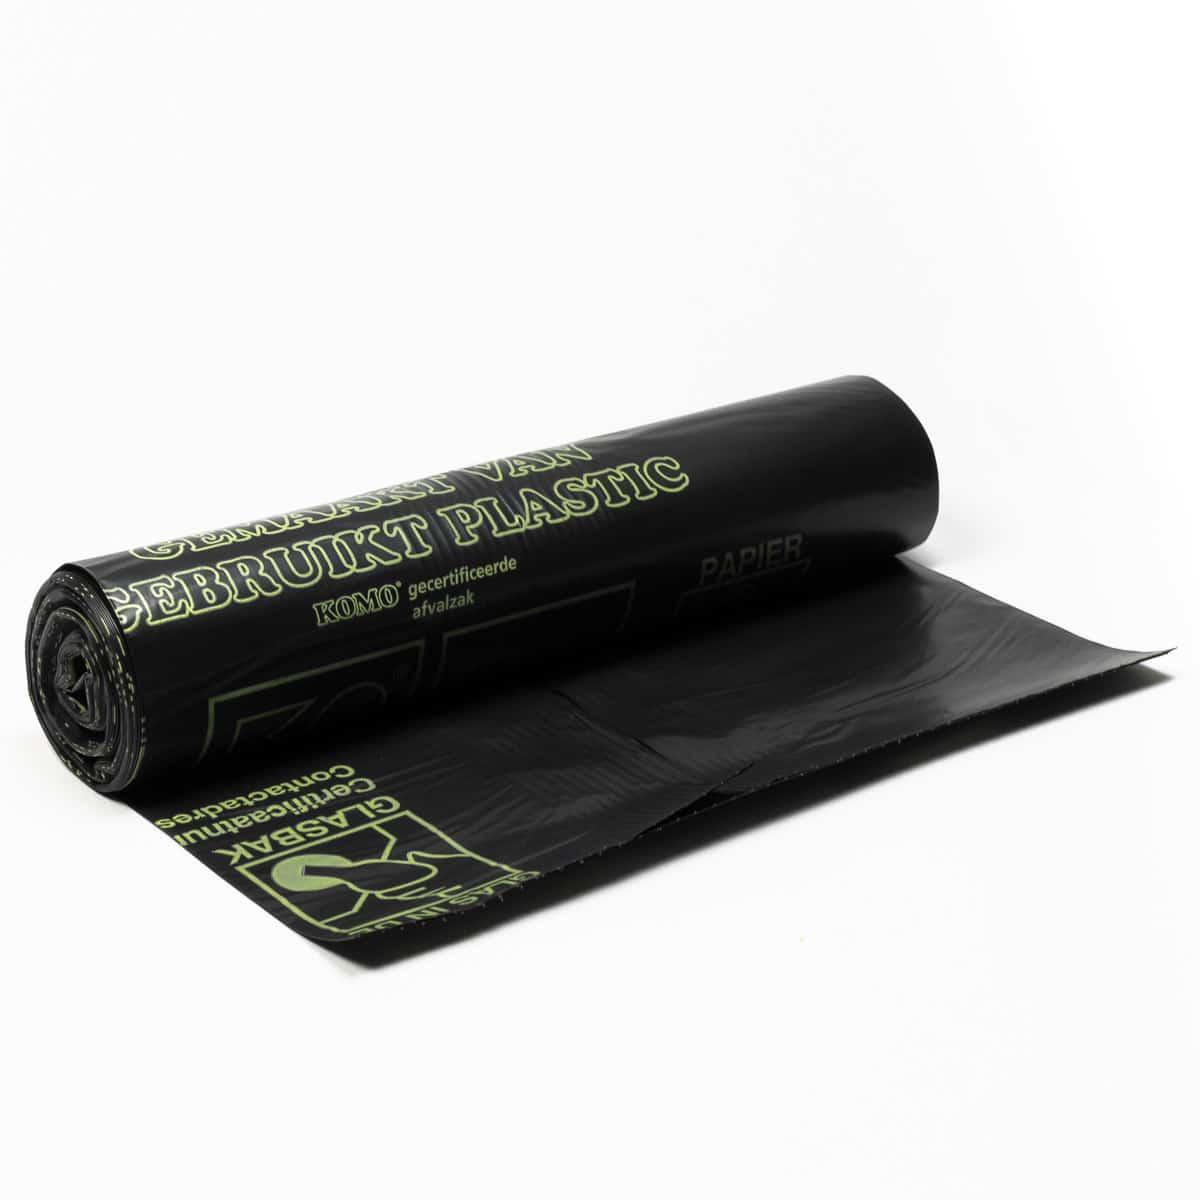 LDPE afvalzakken KOMO - 60 x 80cm x 50my (400 st)